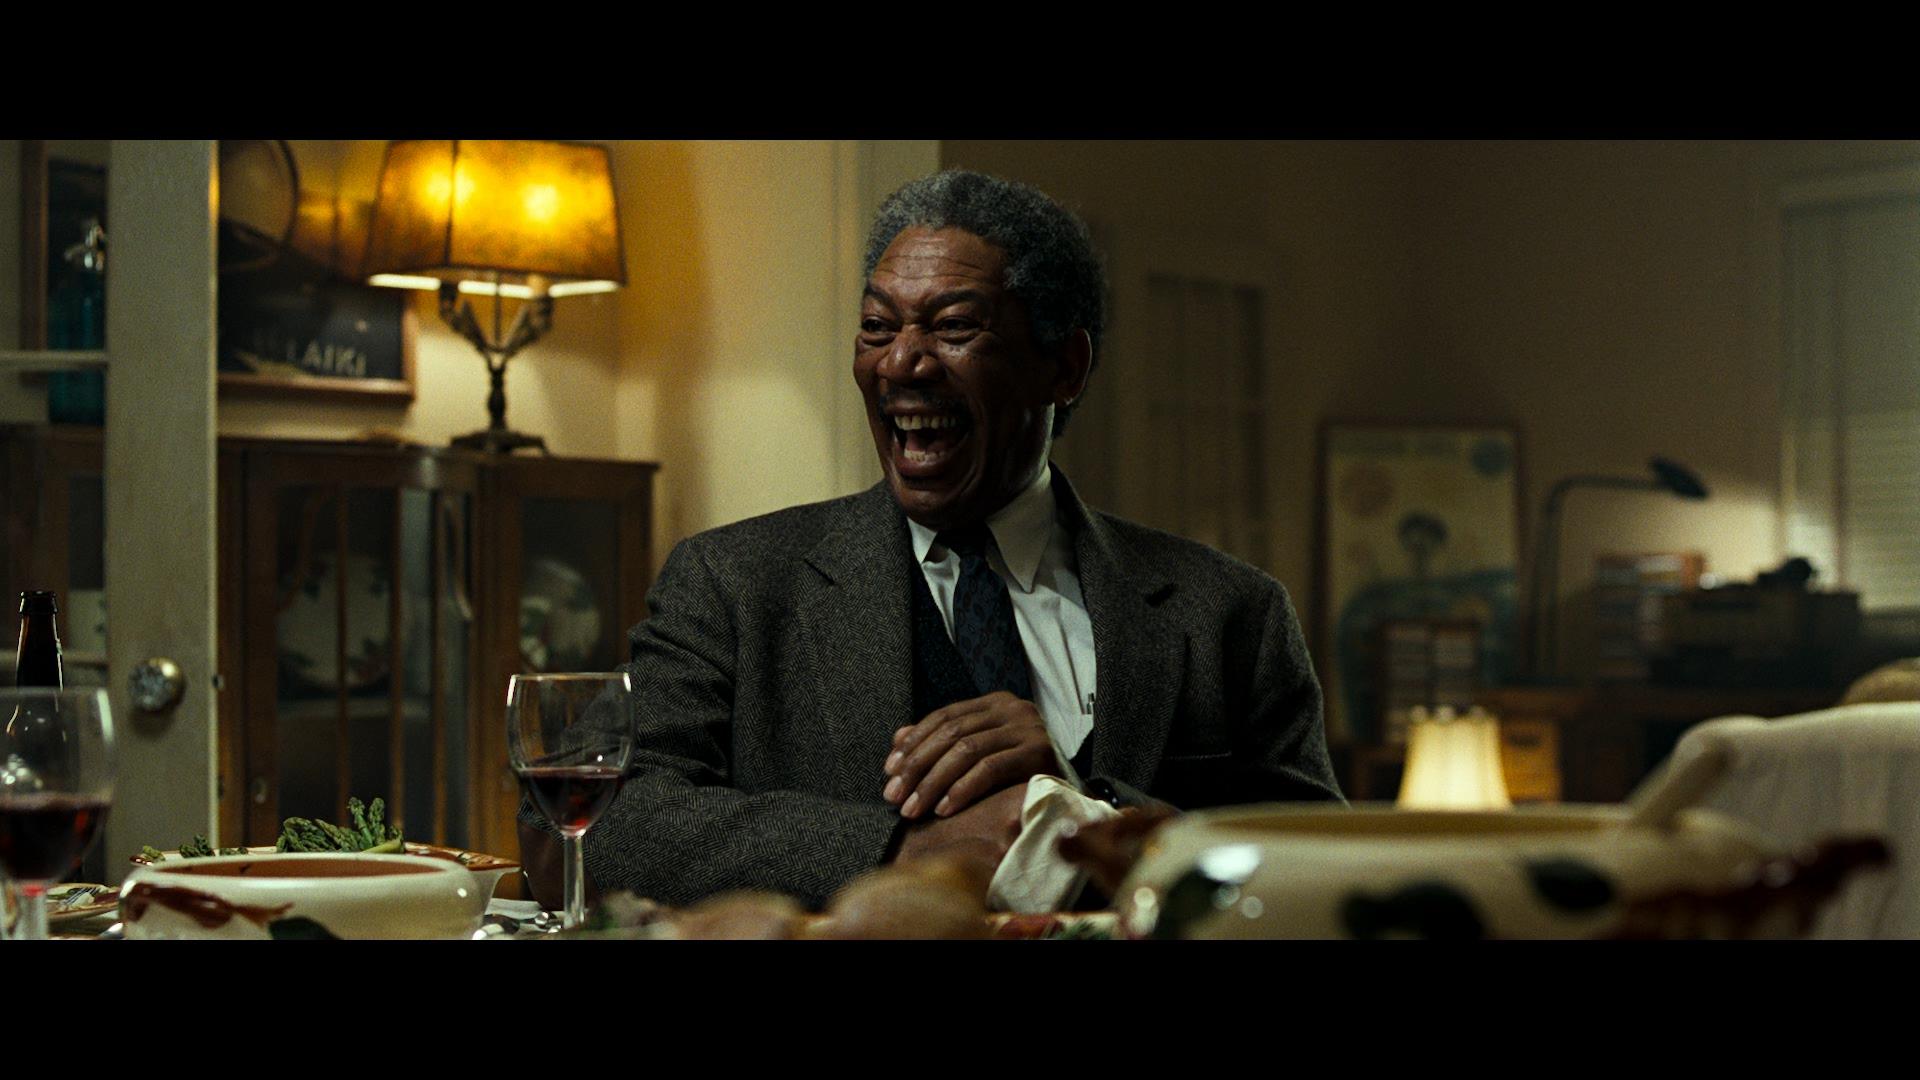 Blu-ray Screenshot #13 / 35